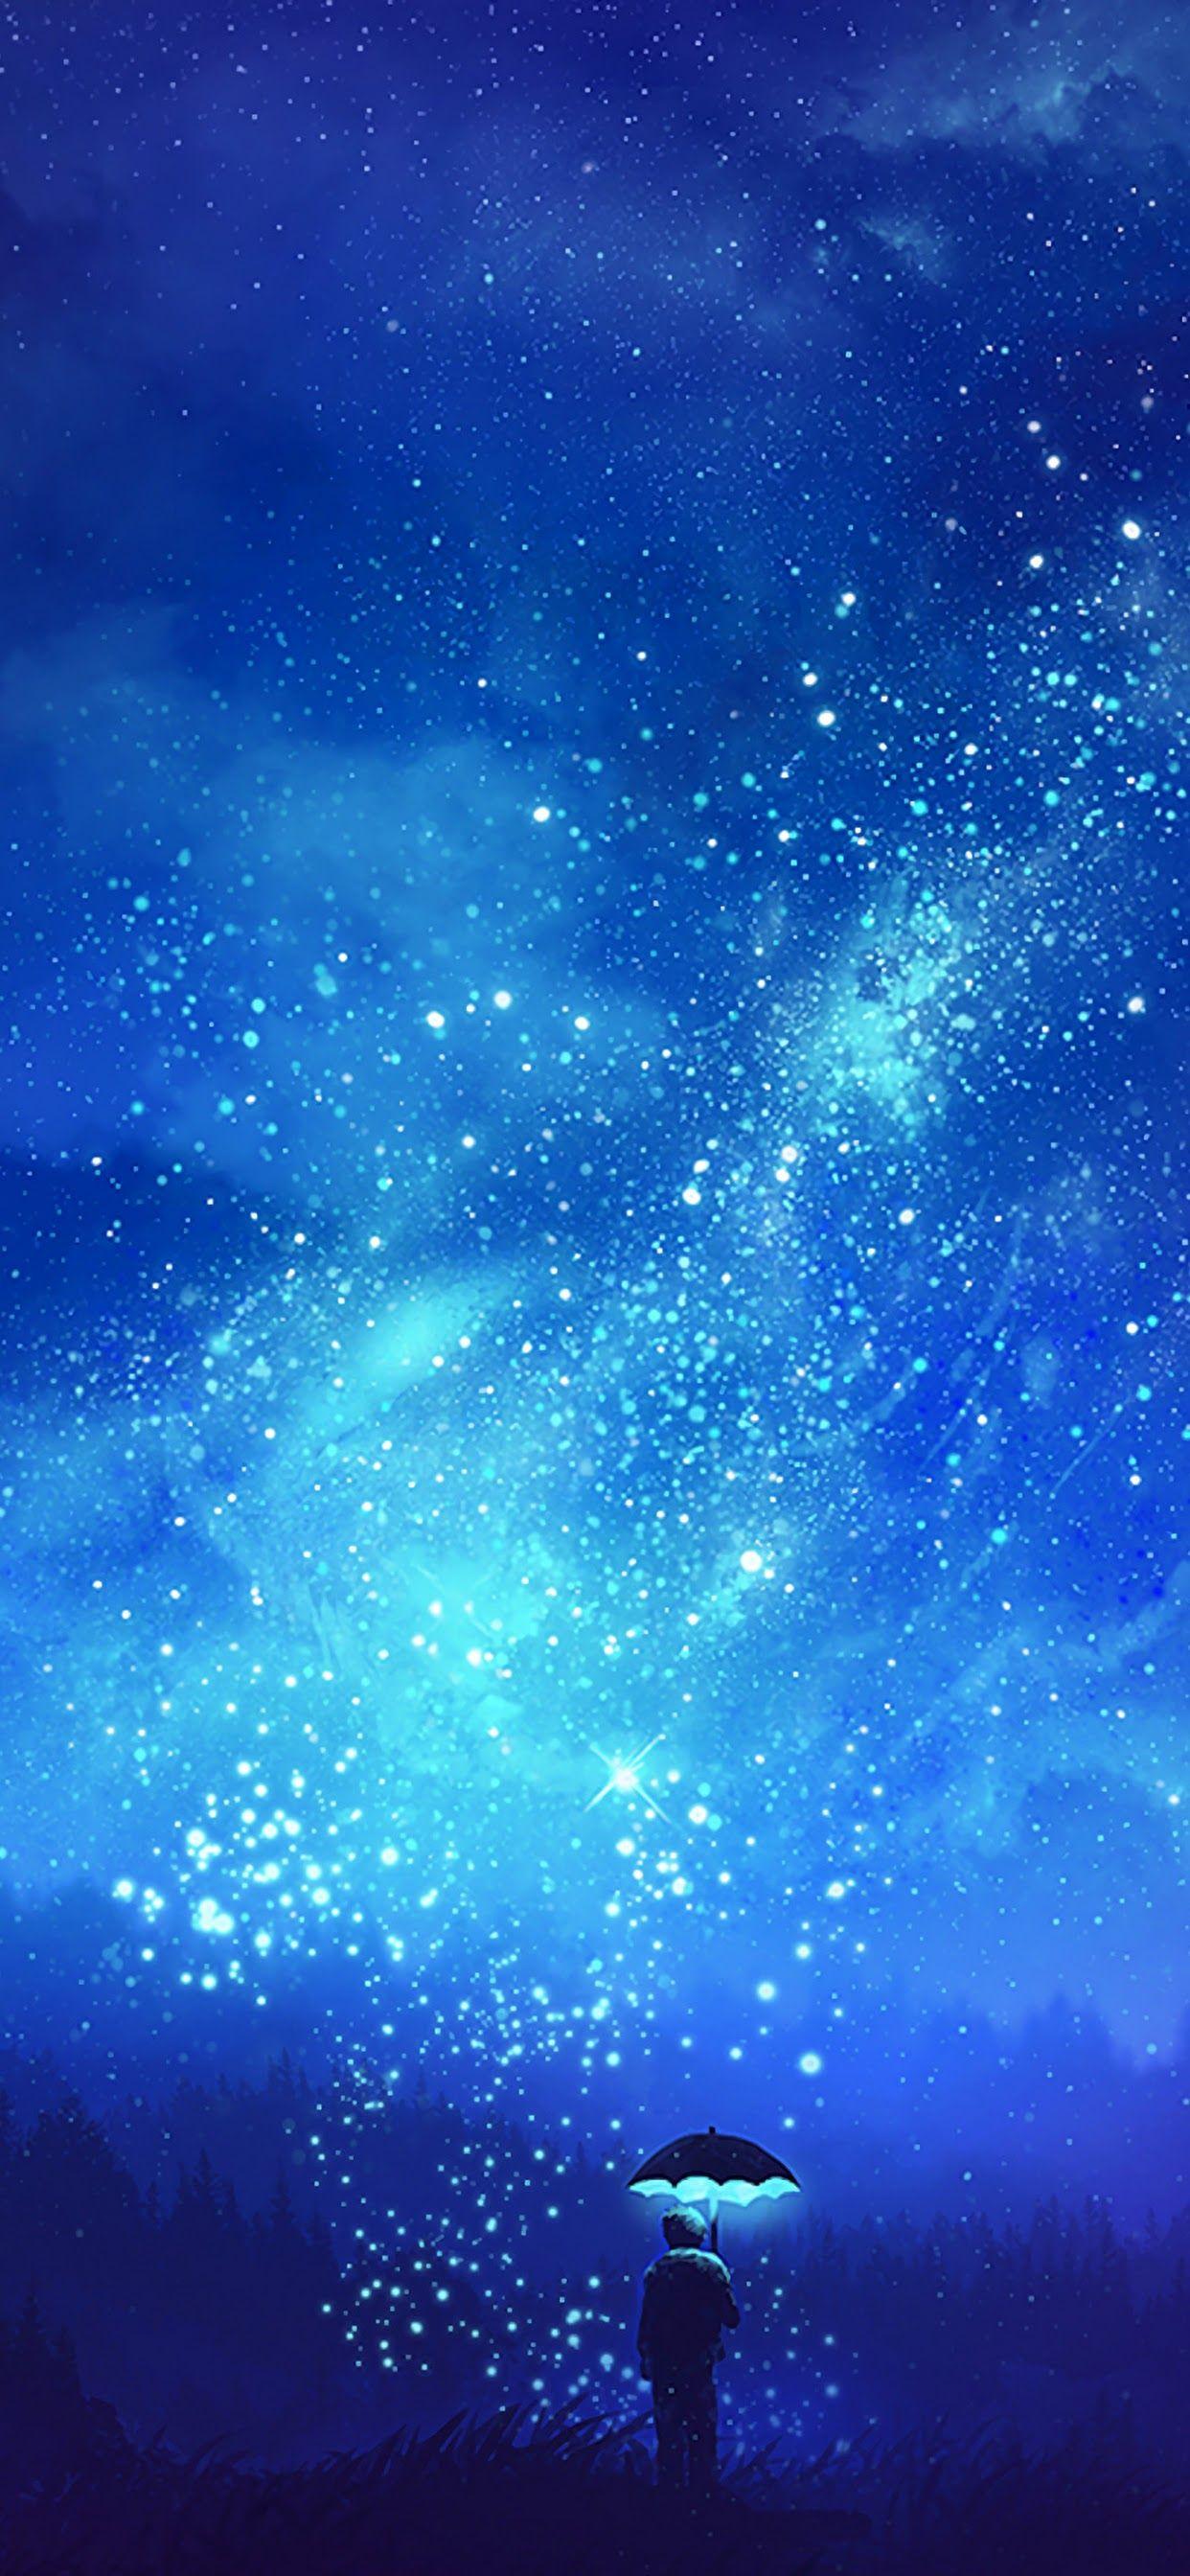 4k Night Sky Anime Portrait Wallpapers Wallpaper Cave